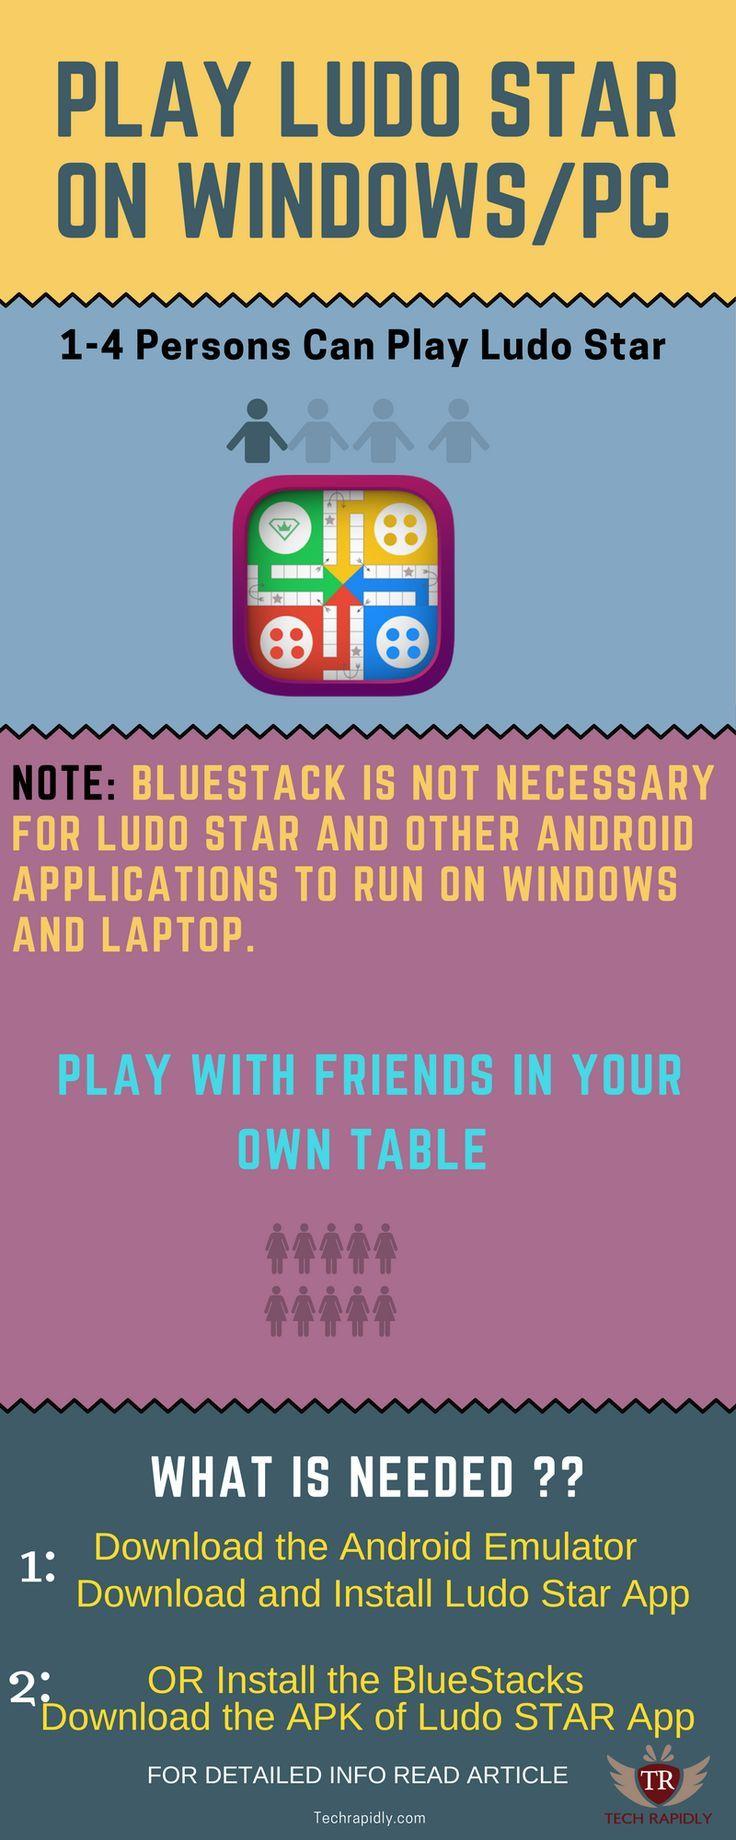 windows 10 tips and tricks pdf